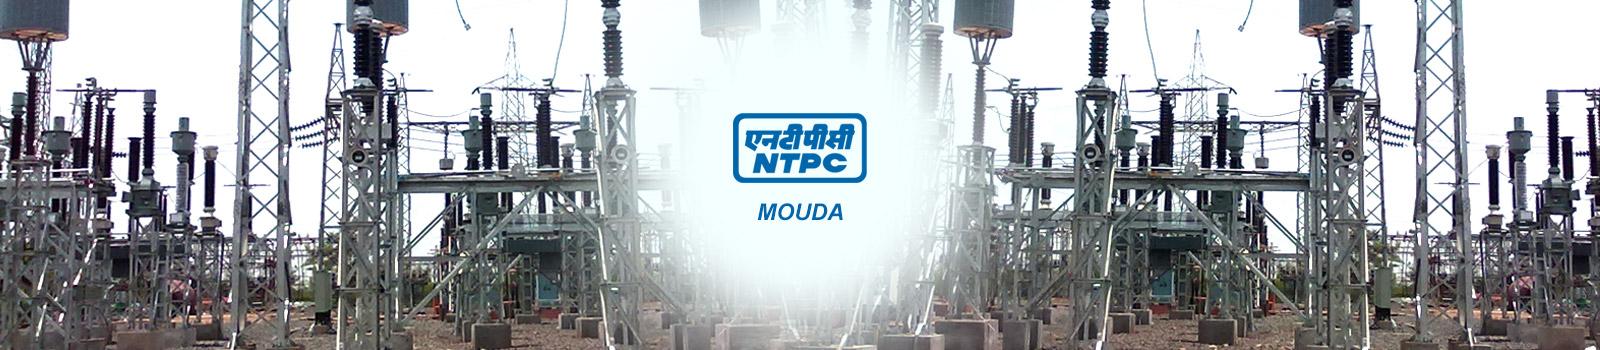 NTPC, Mouda